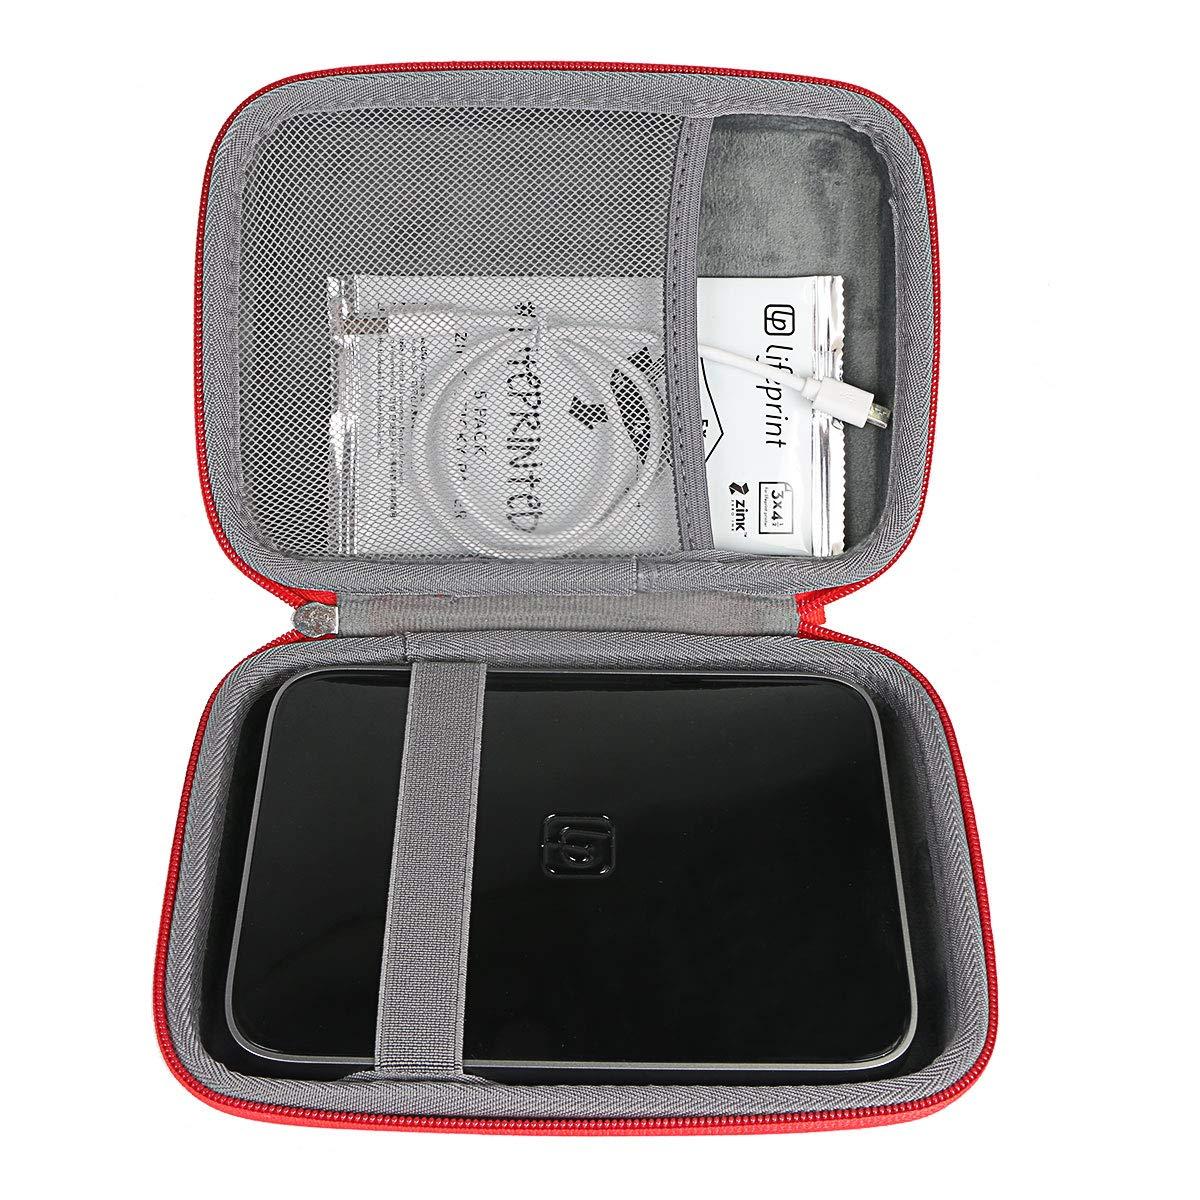 co2crea Hard Travel Case for Lifeprint 3x4.5 Portable Photo Video Printer (Red)